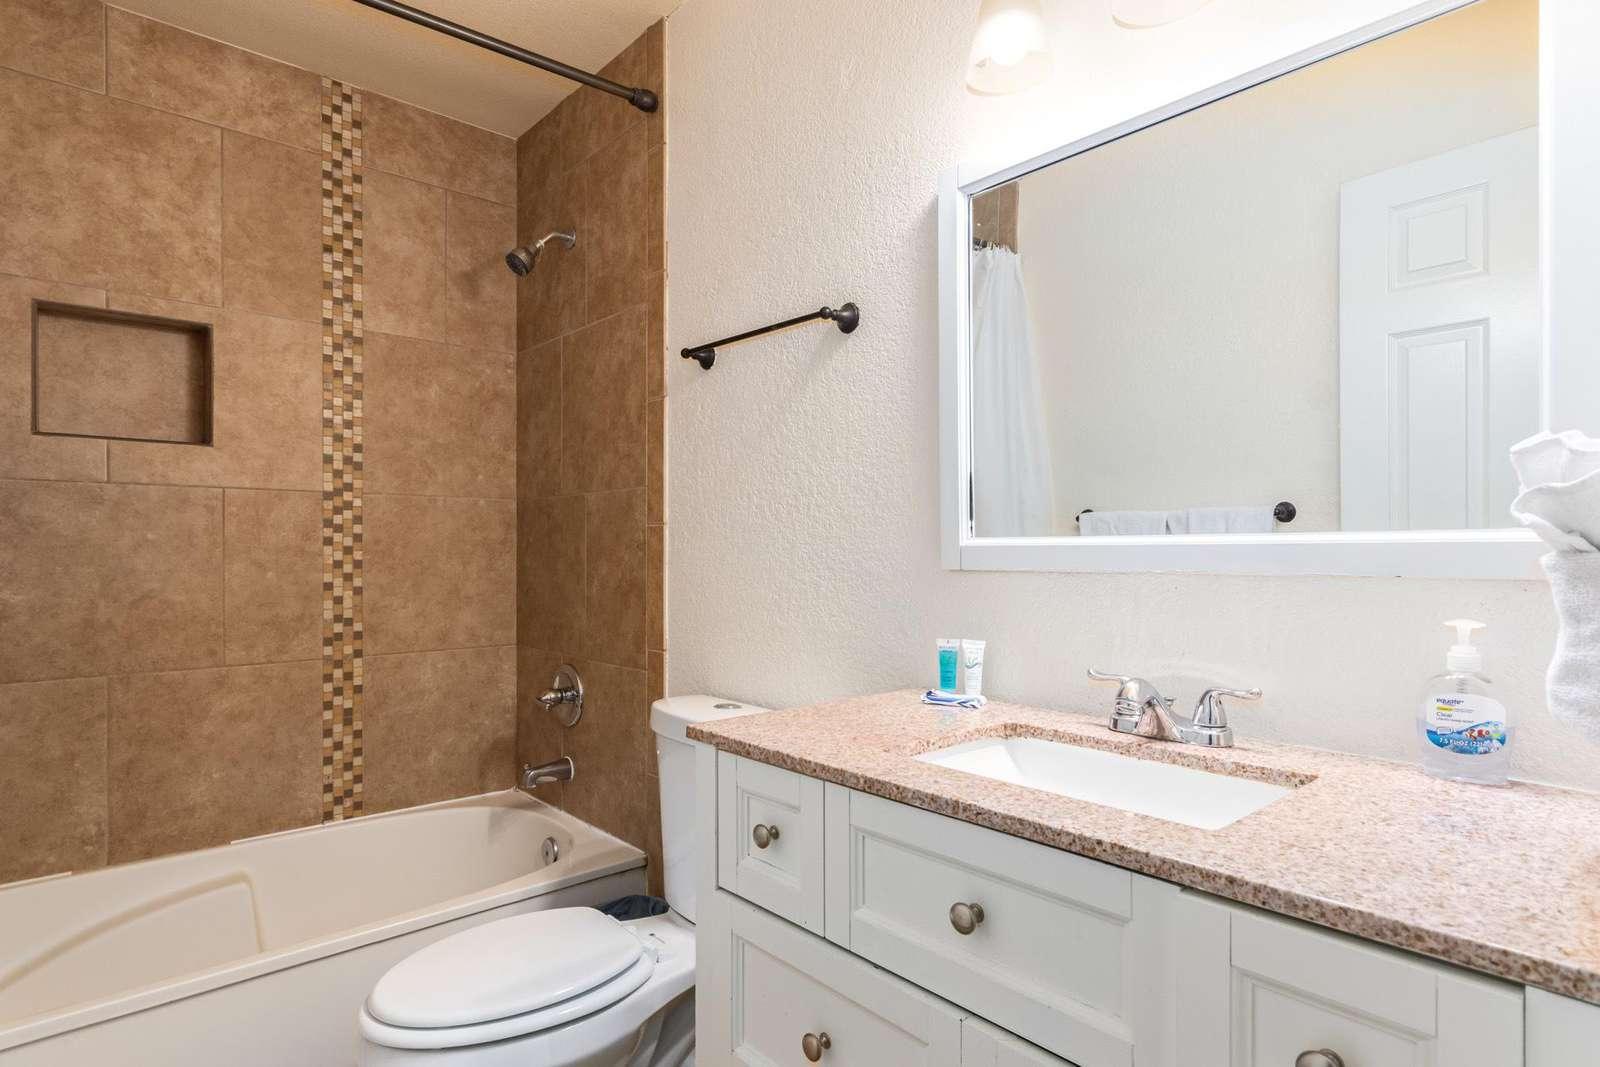 Main Bathroom Has A Tub/Shower Combination.